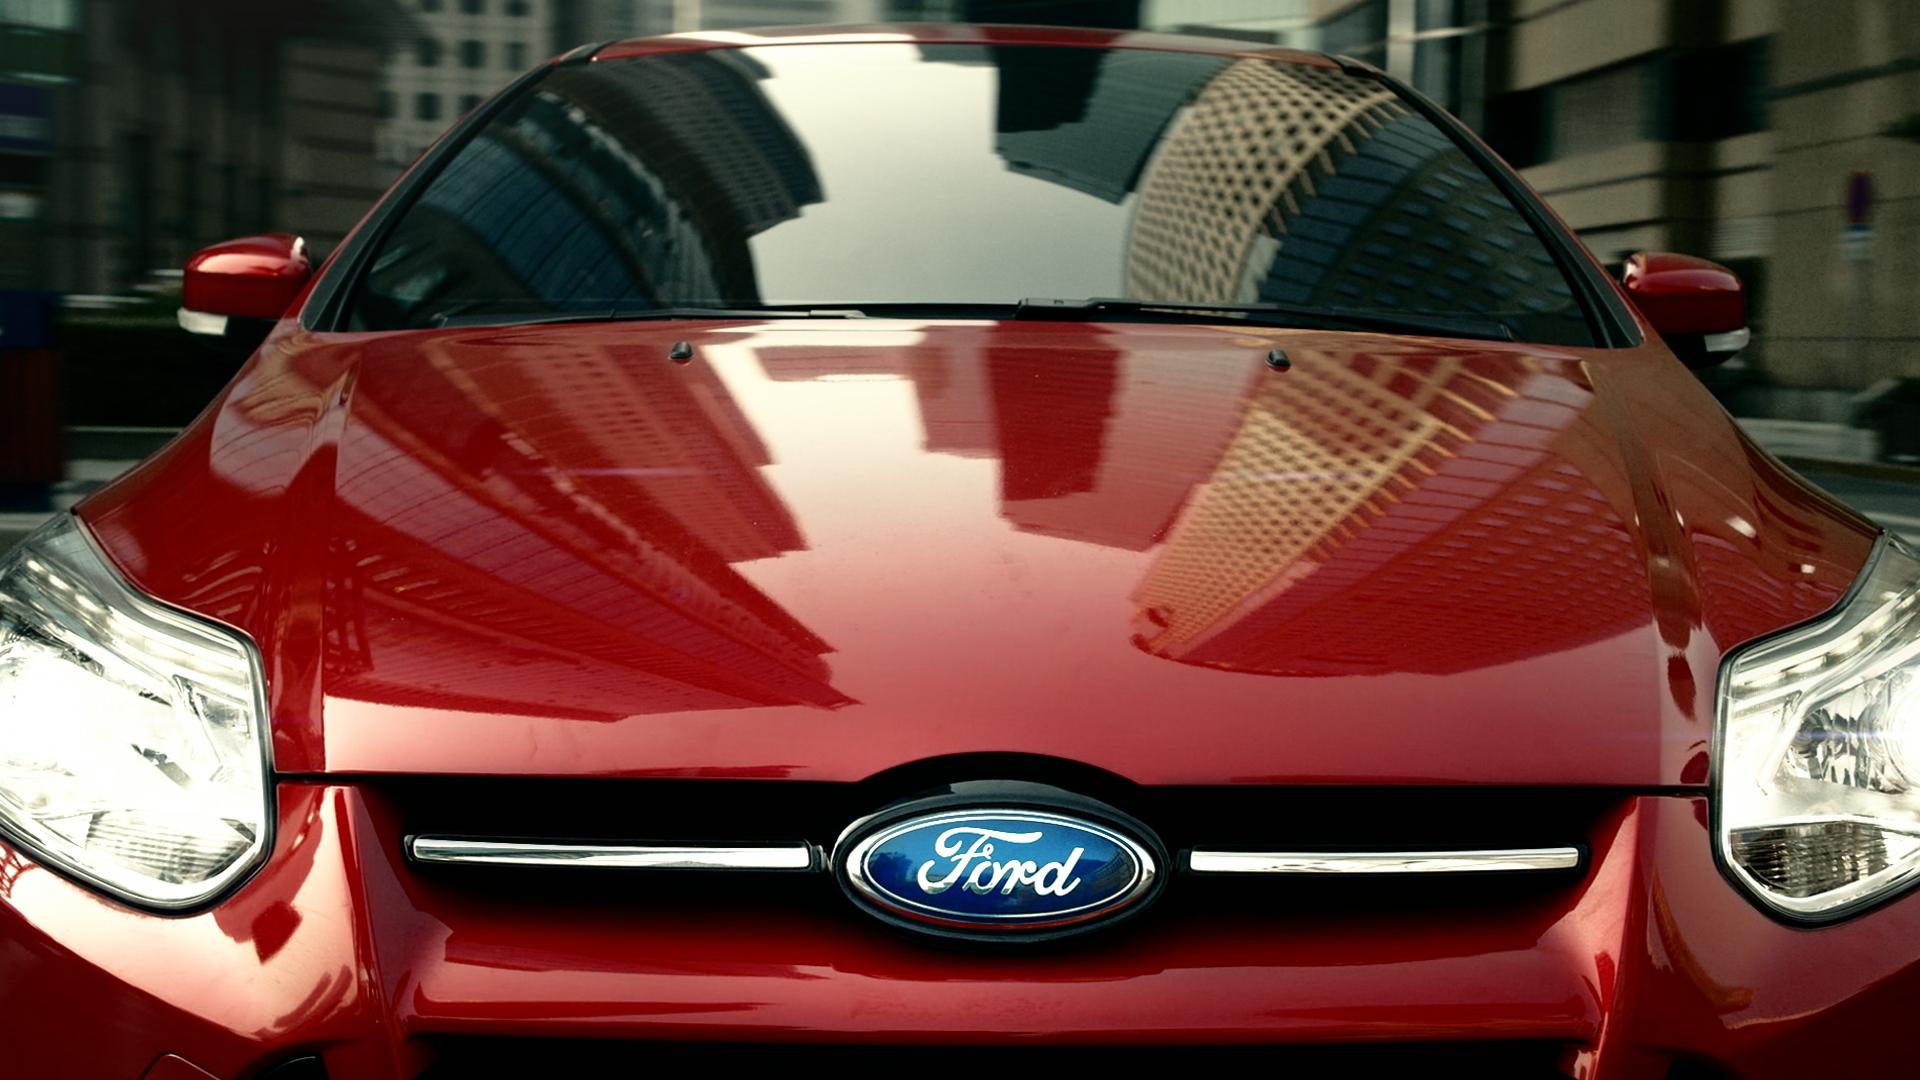 Ford Focus – Sync